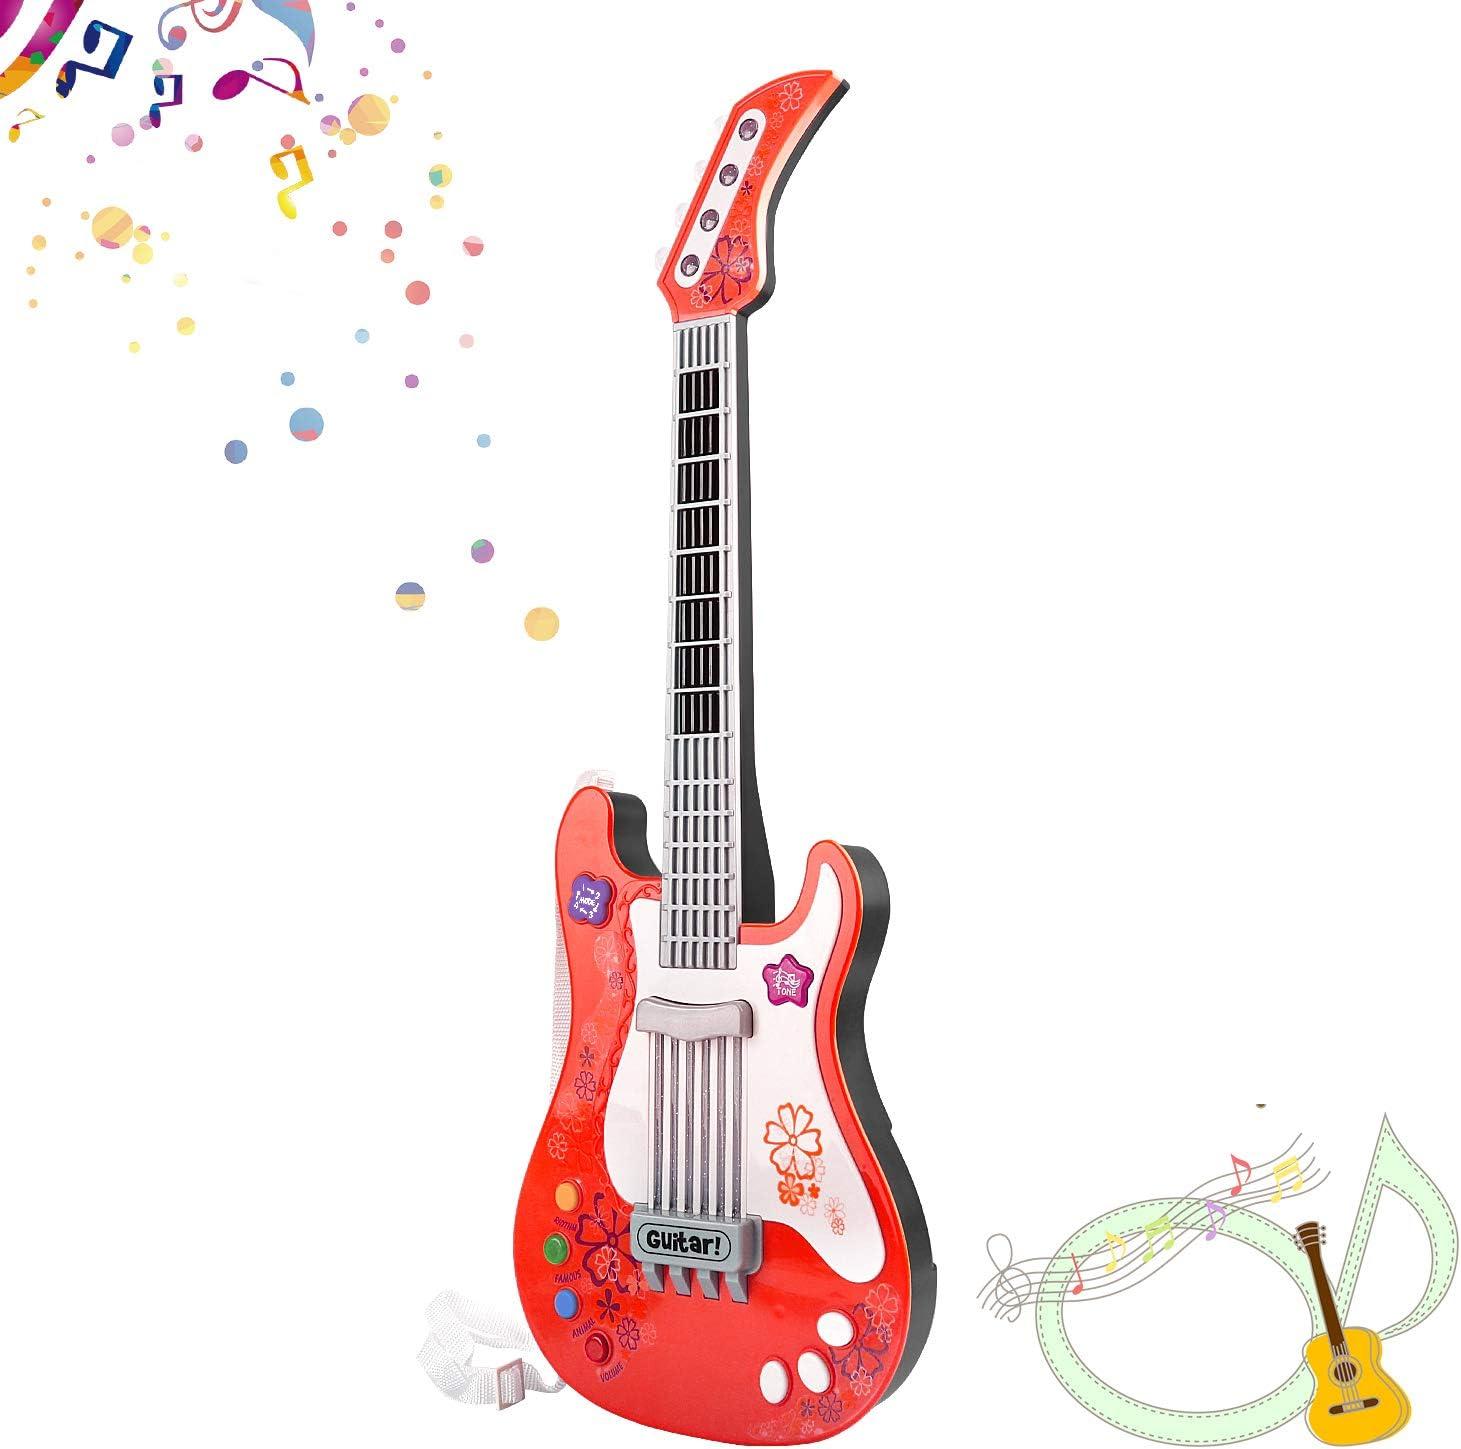 Musica Guitars Gifts Guitar Toy Kids Electronic Developmental Music rock toy